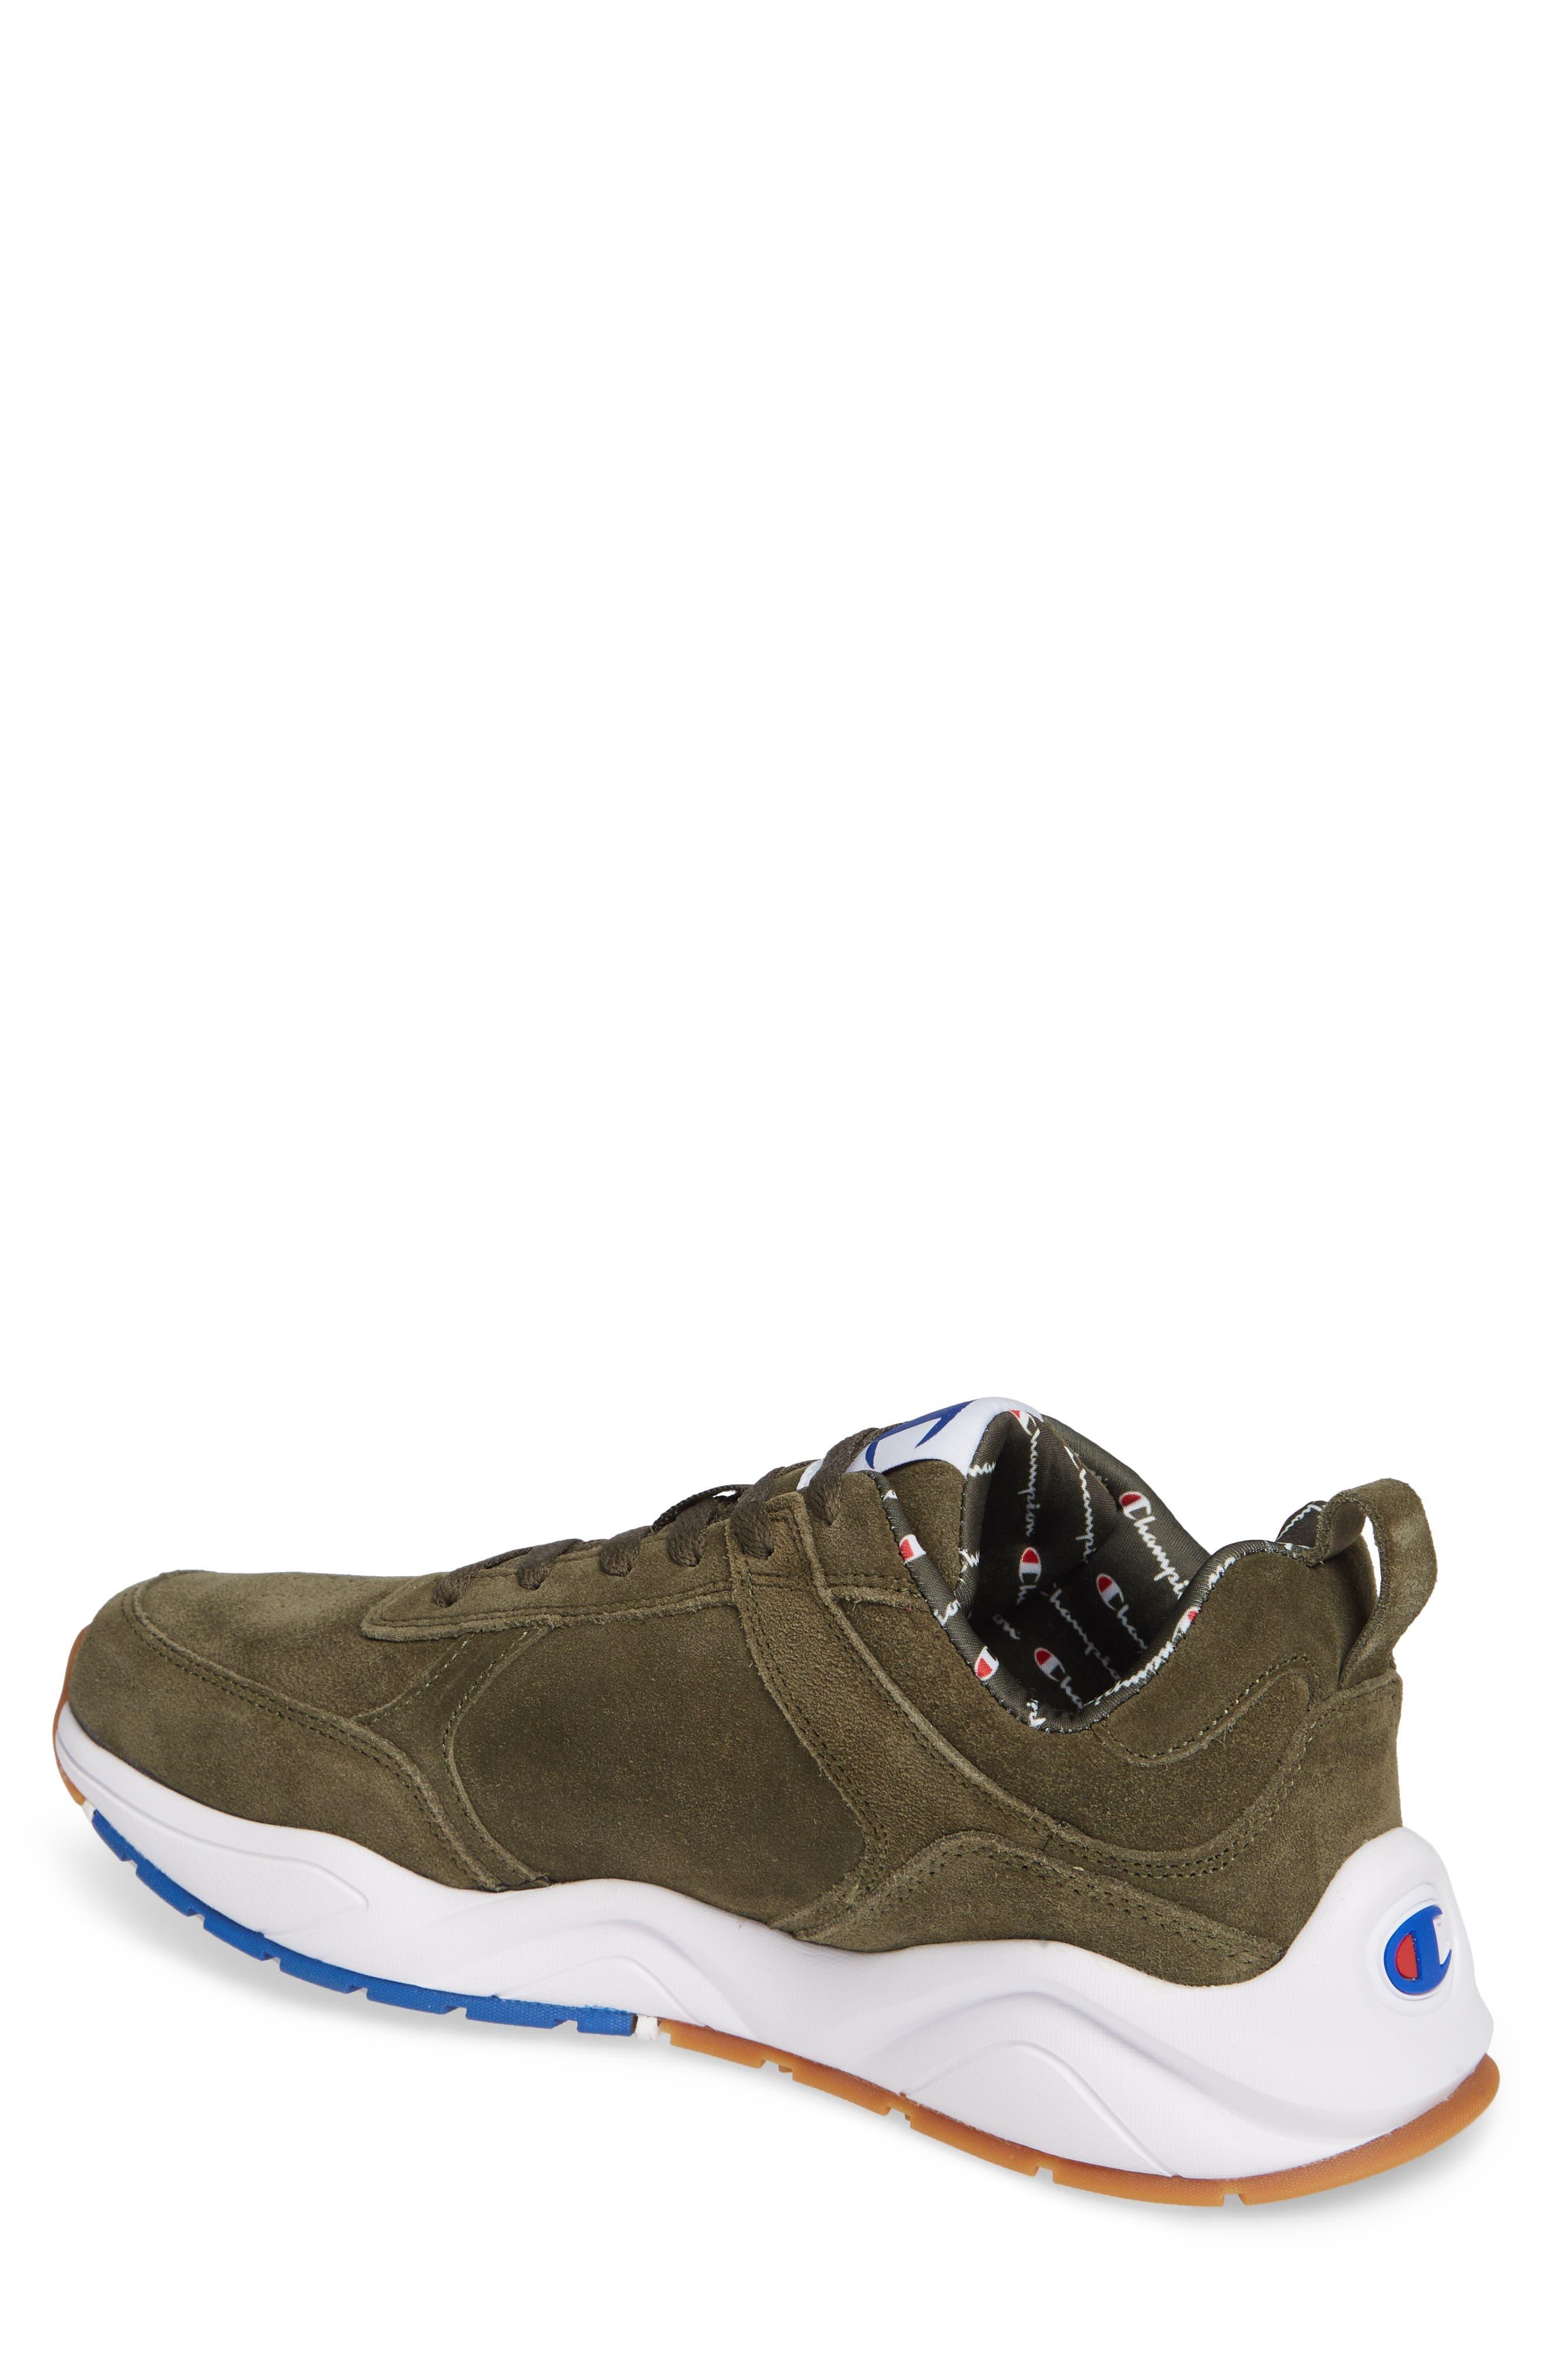 93Eighteen Sneaker,                             Alternate thumbnail 2, color,                             HIKER GREEN SUEDE